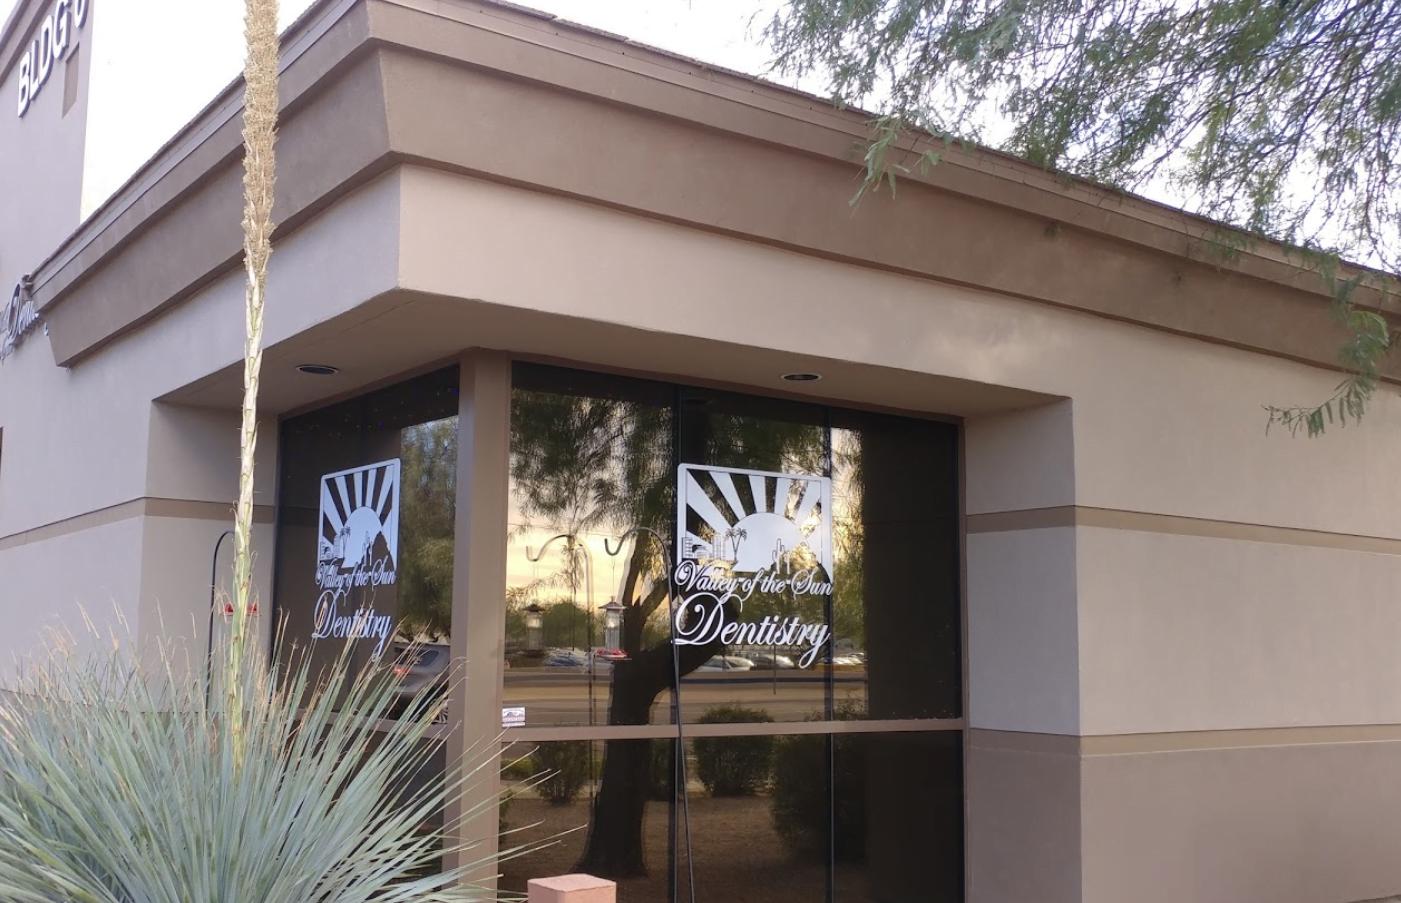 Dental Office in Glendale and Phoenix area